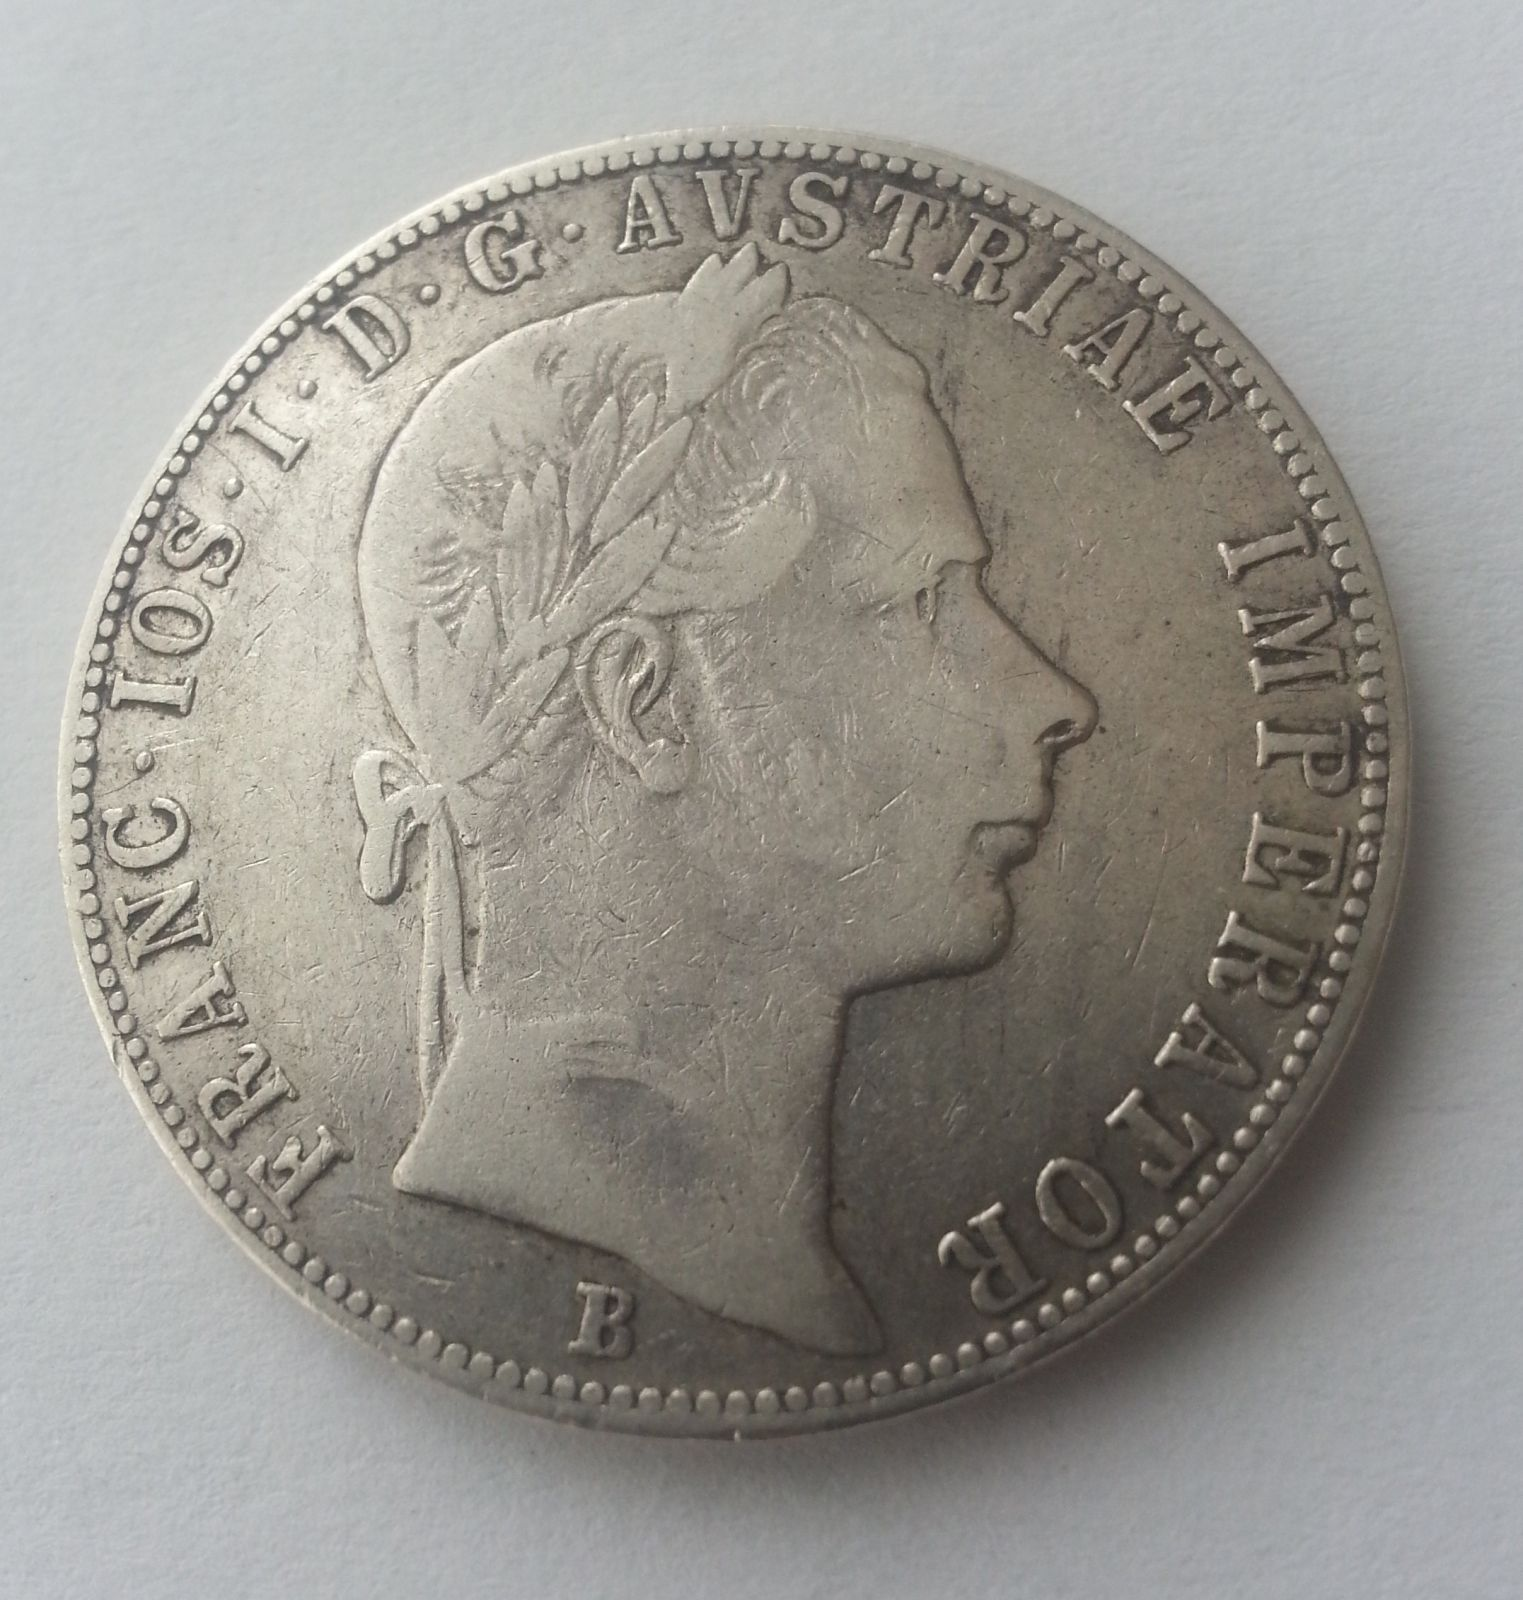 1 Fl., 1858, B, Uhry